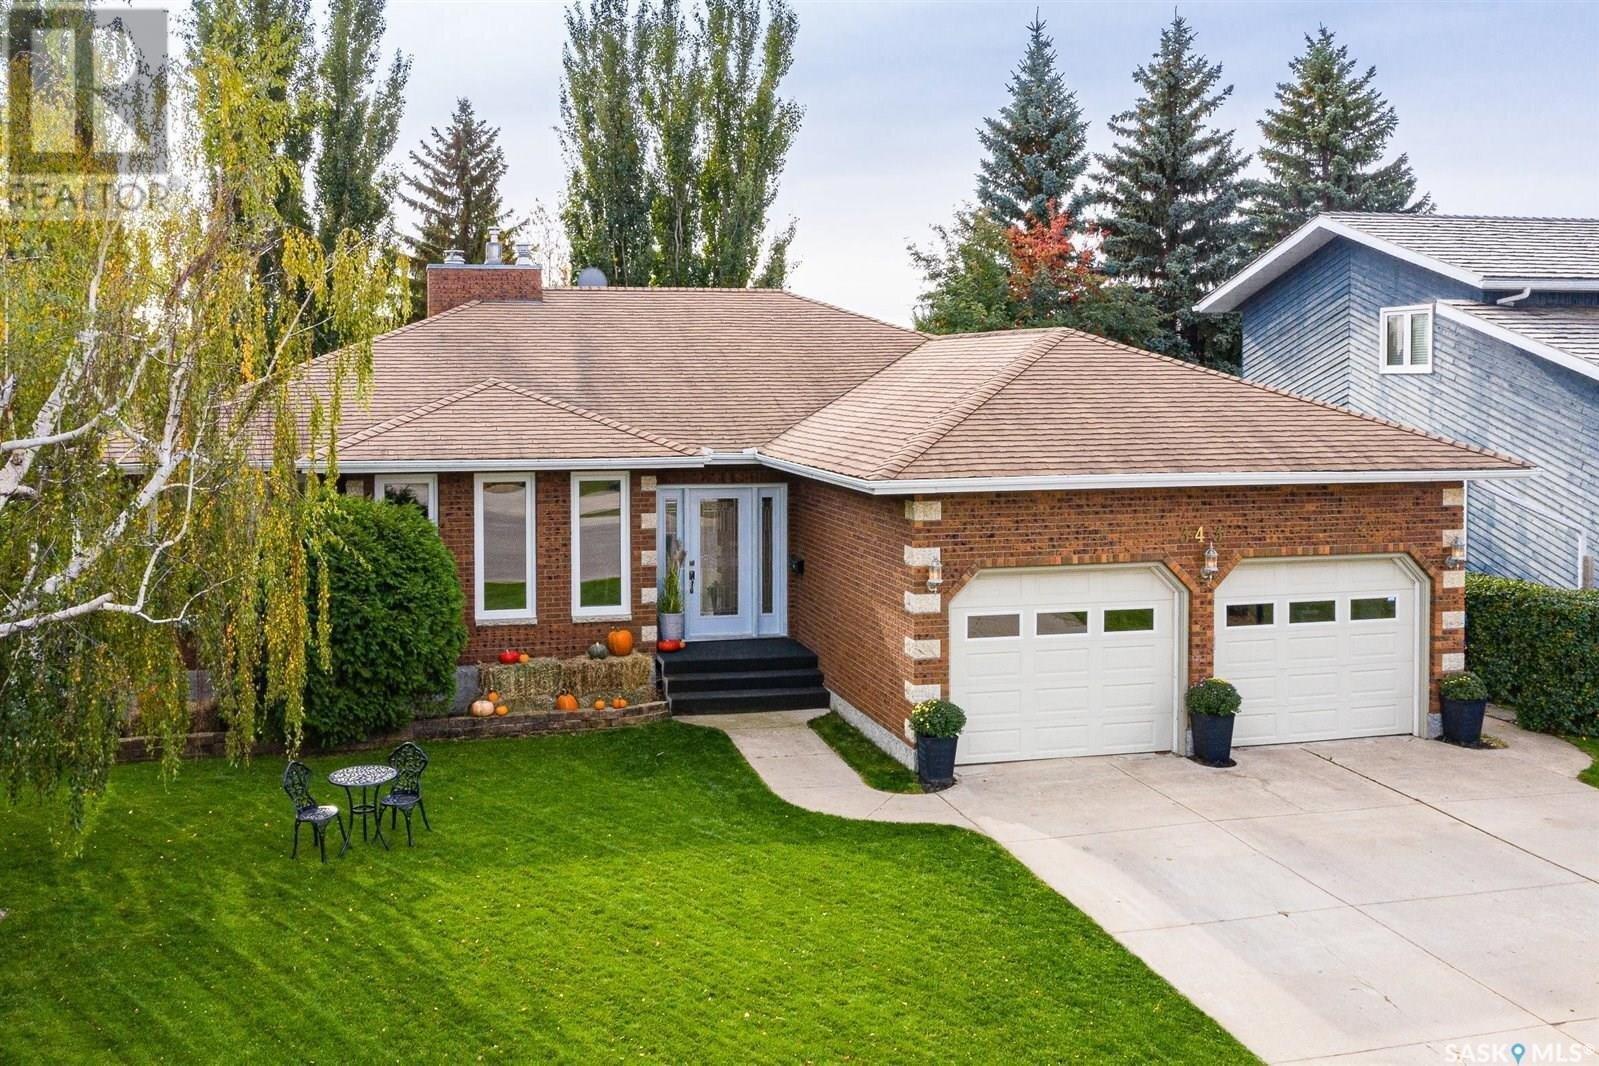 House for sale at 343 Neusch Wy Saskatoon Saskatchewan - MLS: SK832054